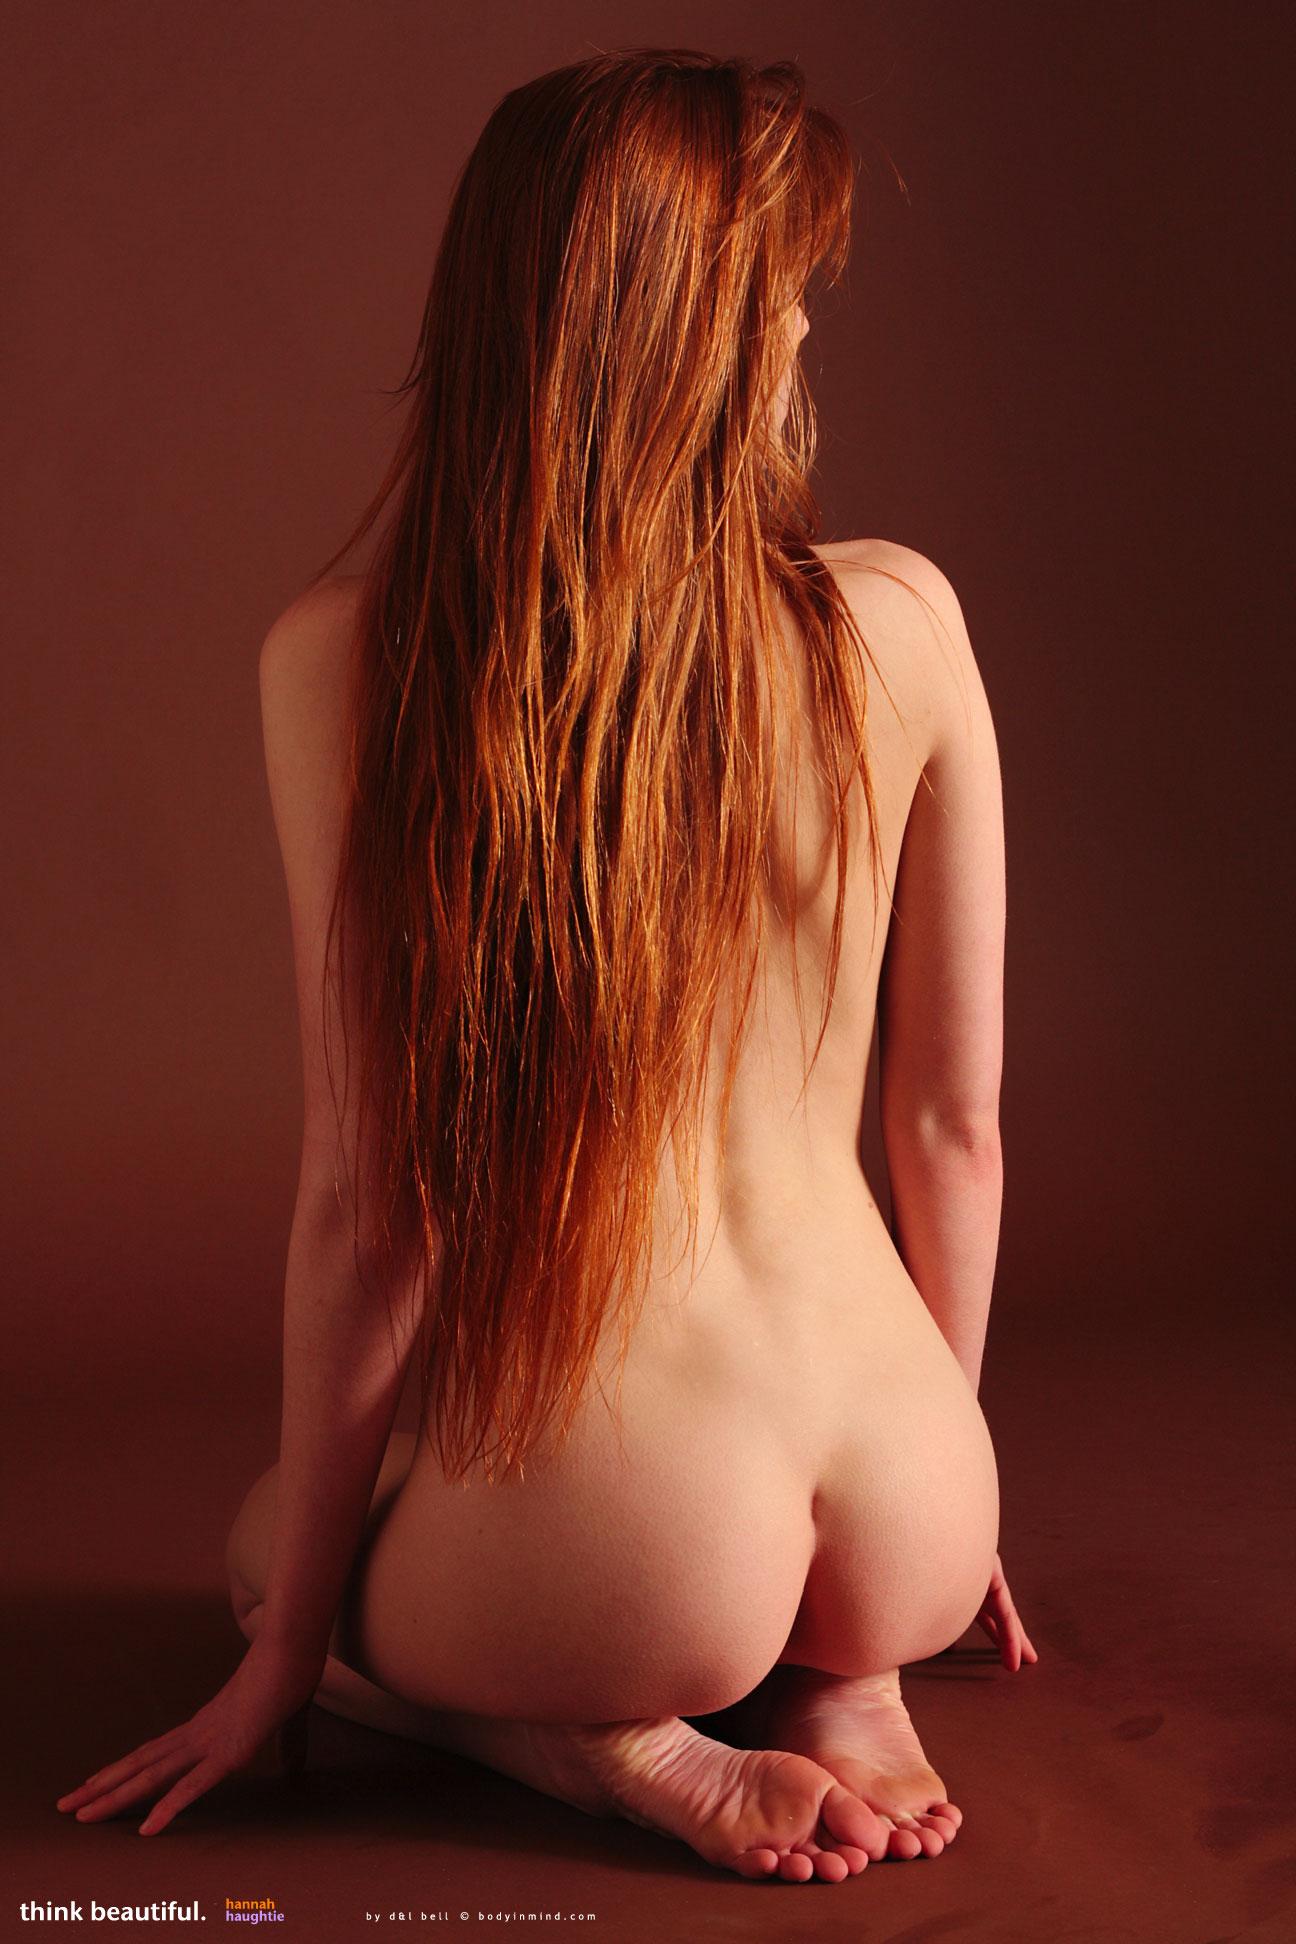 Hannah Haughtie - NudesPuri.com